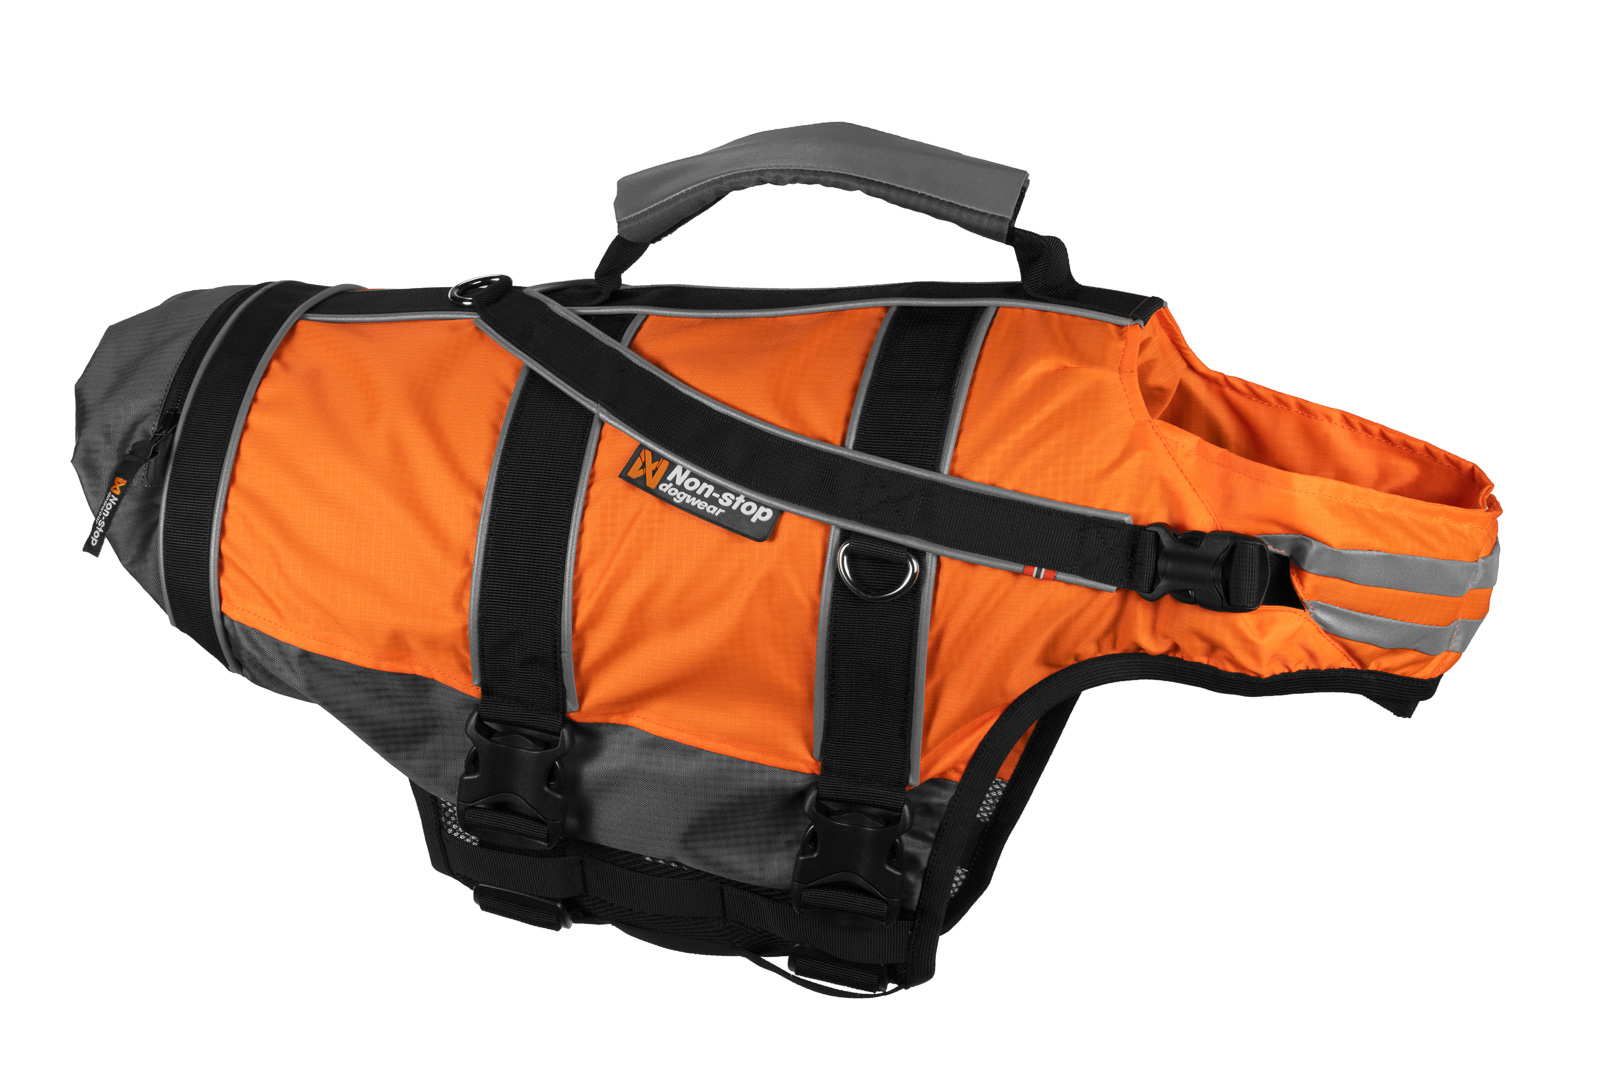 Safe life jacket 2.0